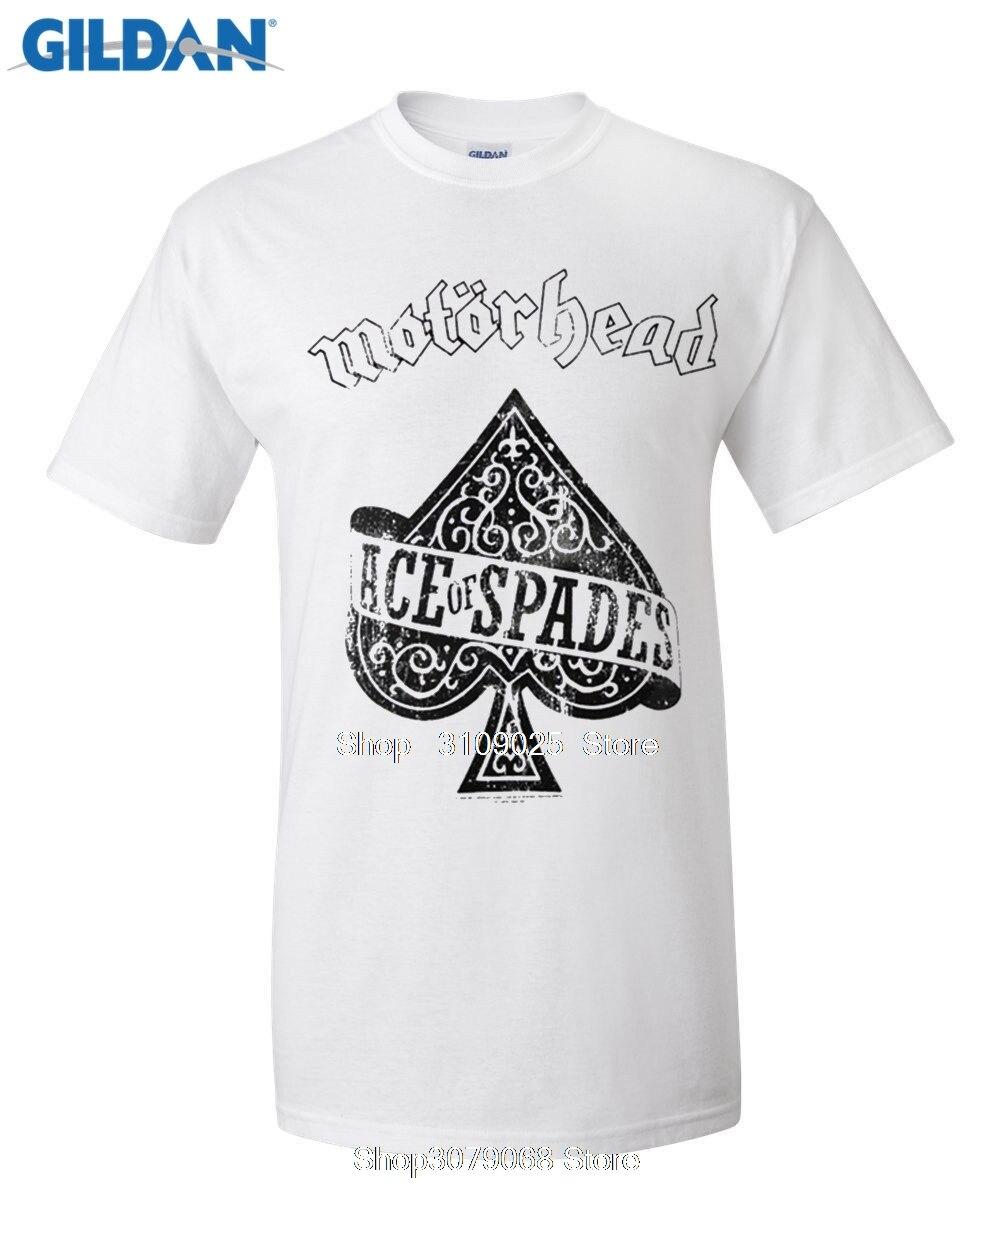 GILDAN customised t-shirts New Fashion Cool Motorhead T-shirts Men Ace Of Spades T Shirts Crew Neck Rock T Shirts ...